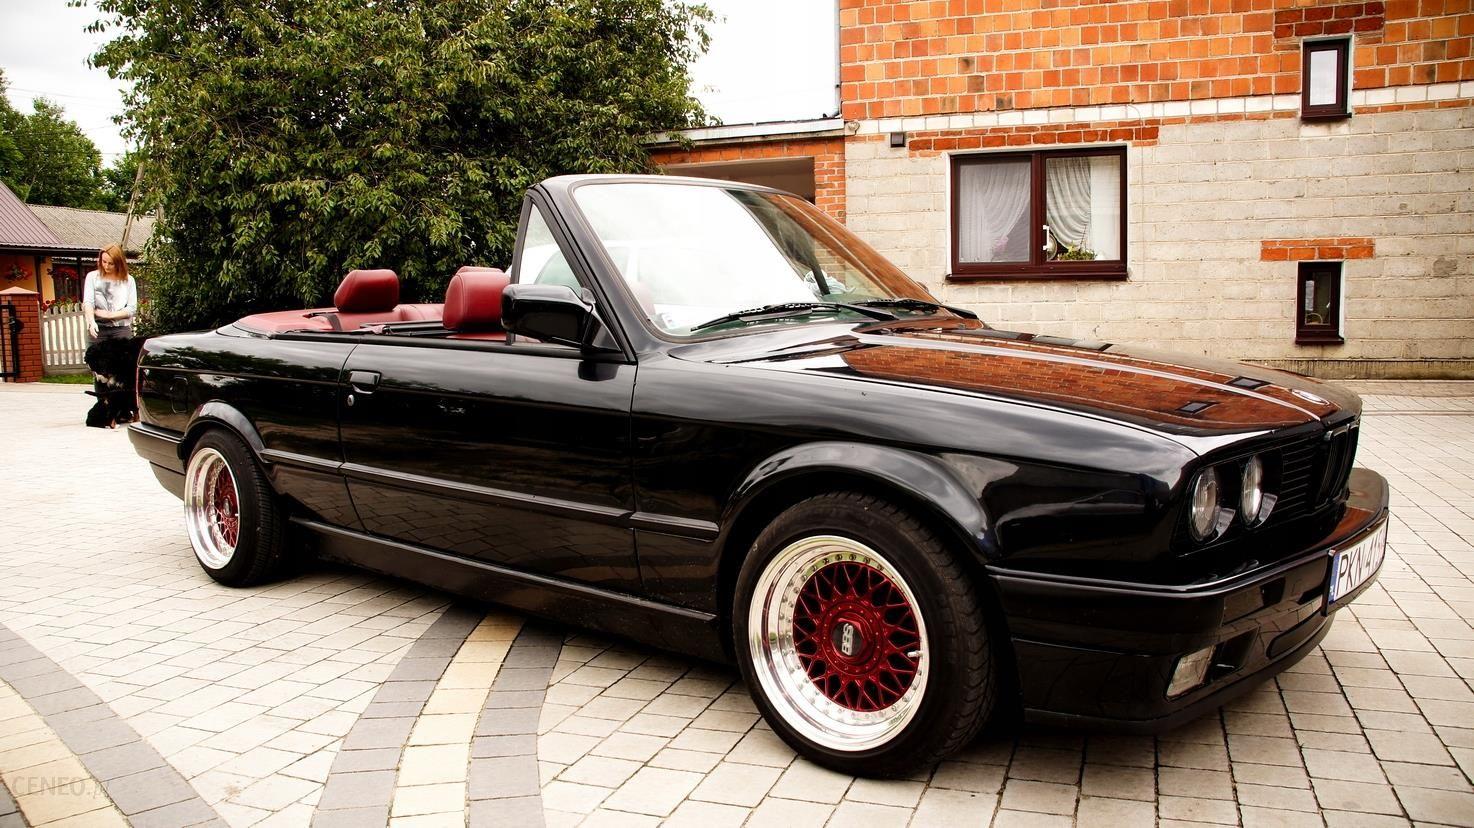 Bmw E30 320i Cabrio Cardinal Red Bbs Rm 9j Opinie I Ceny Na Ceneo Pl